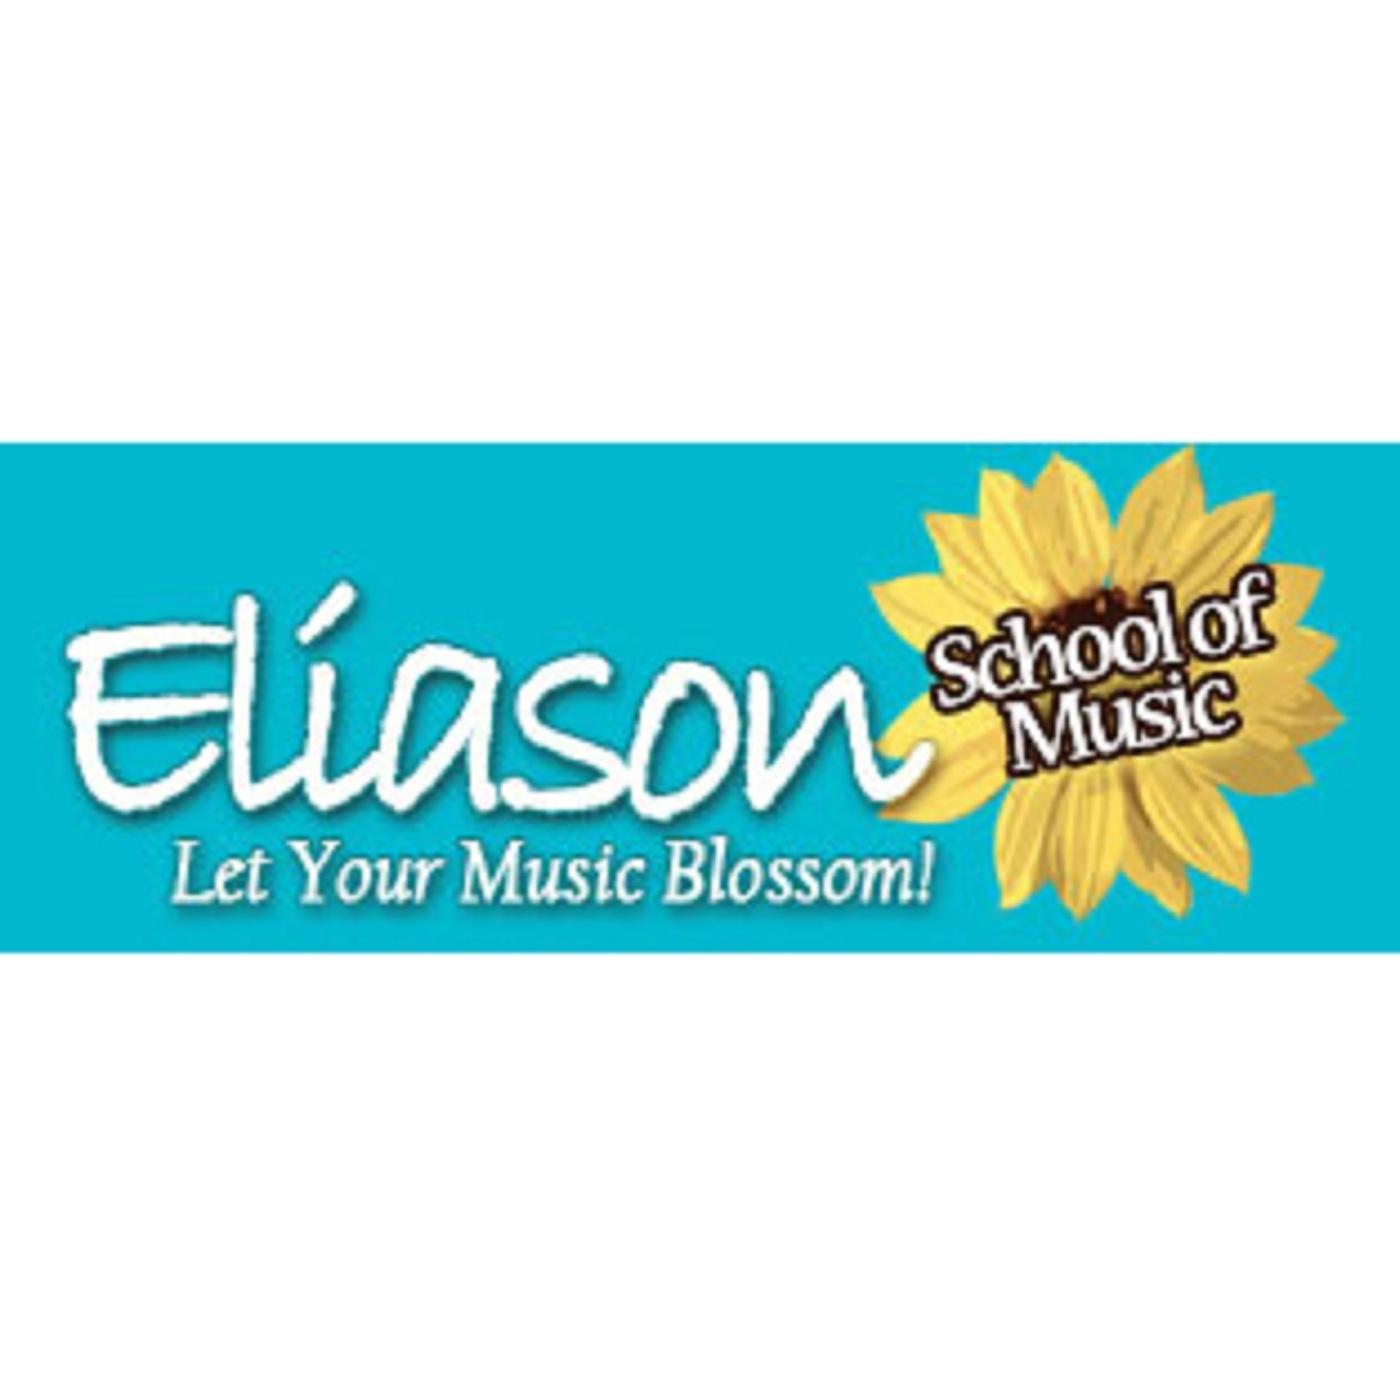 Eliason School Of Music (@eliasonschoolofmusic) Cover Image